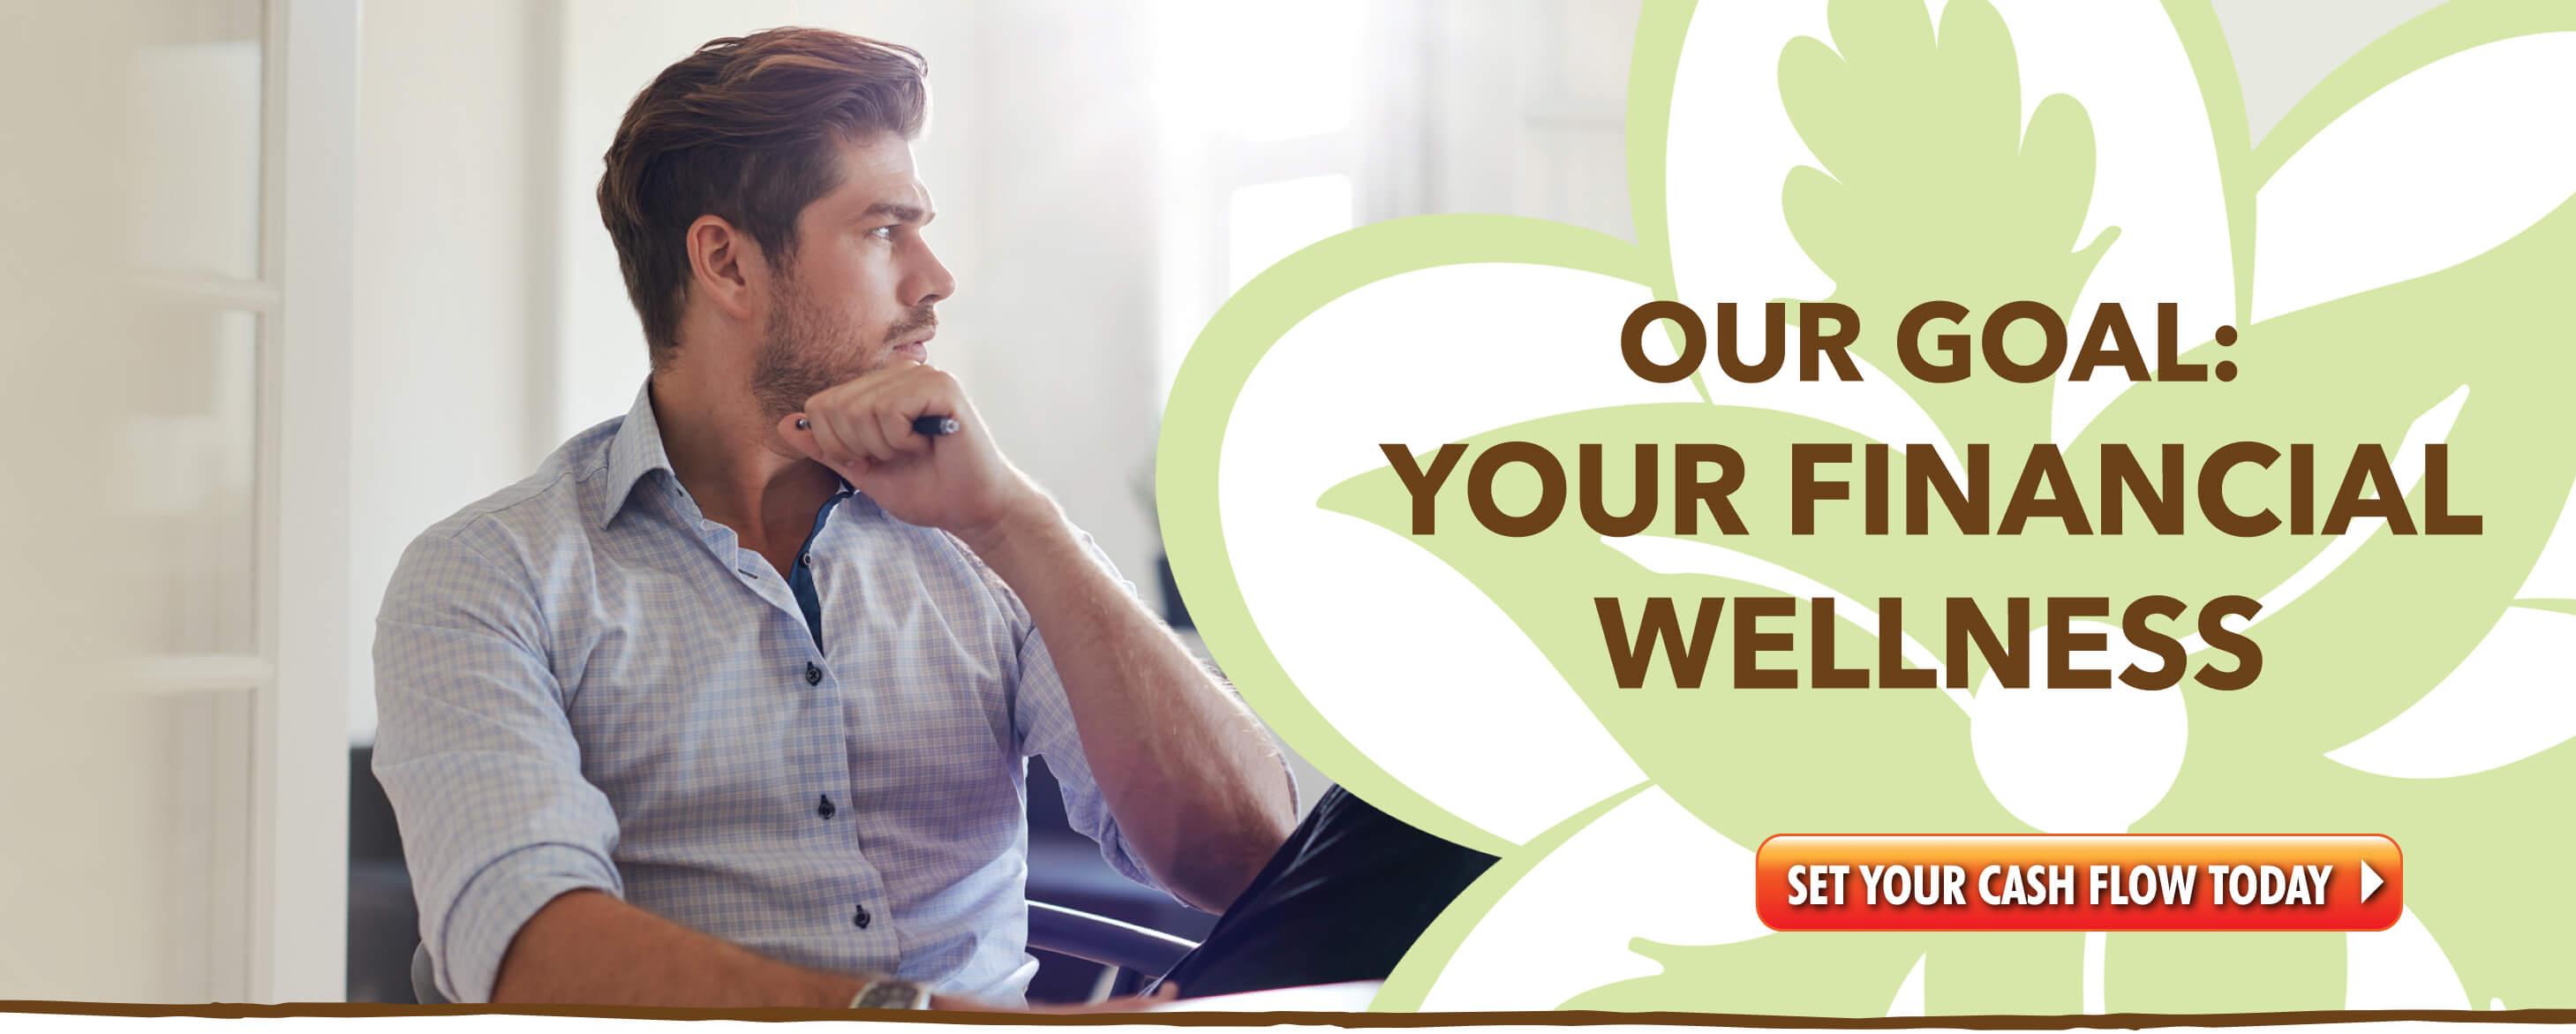 Our Goal:  Your Financial Wellness.  Set your cash flow calendar today!